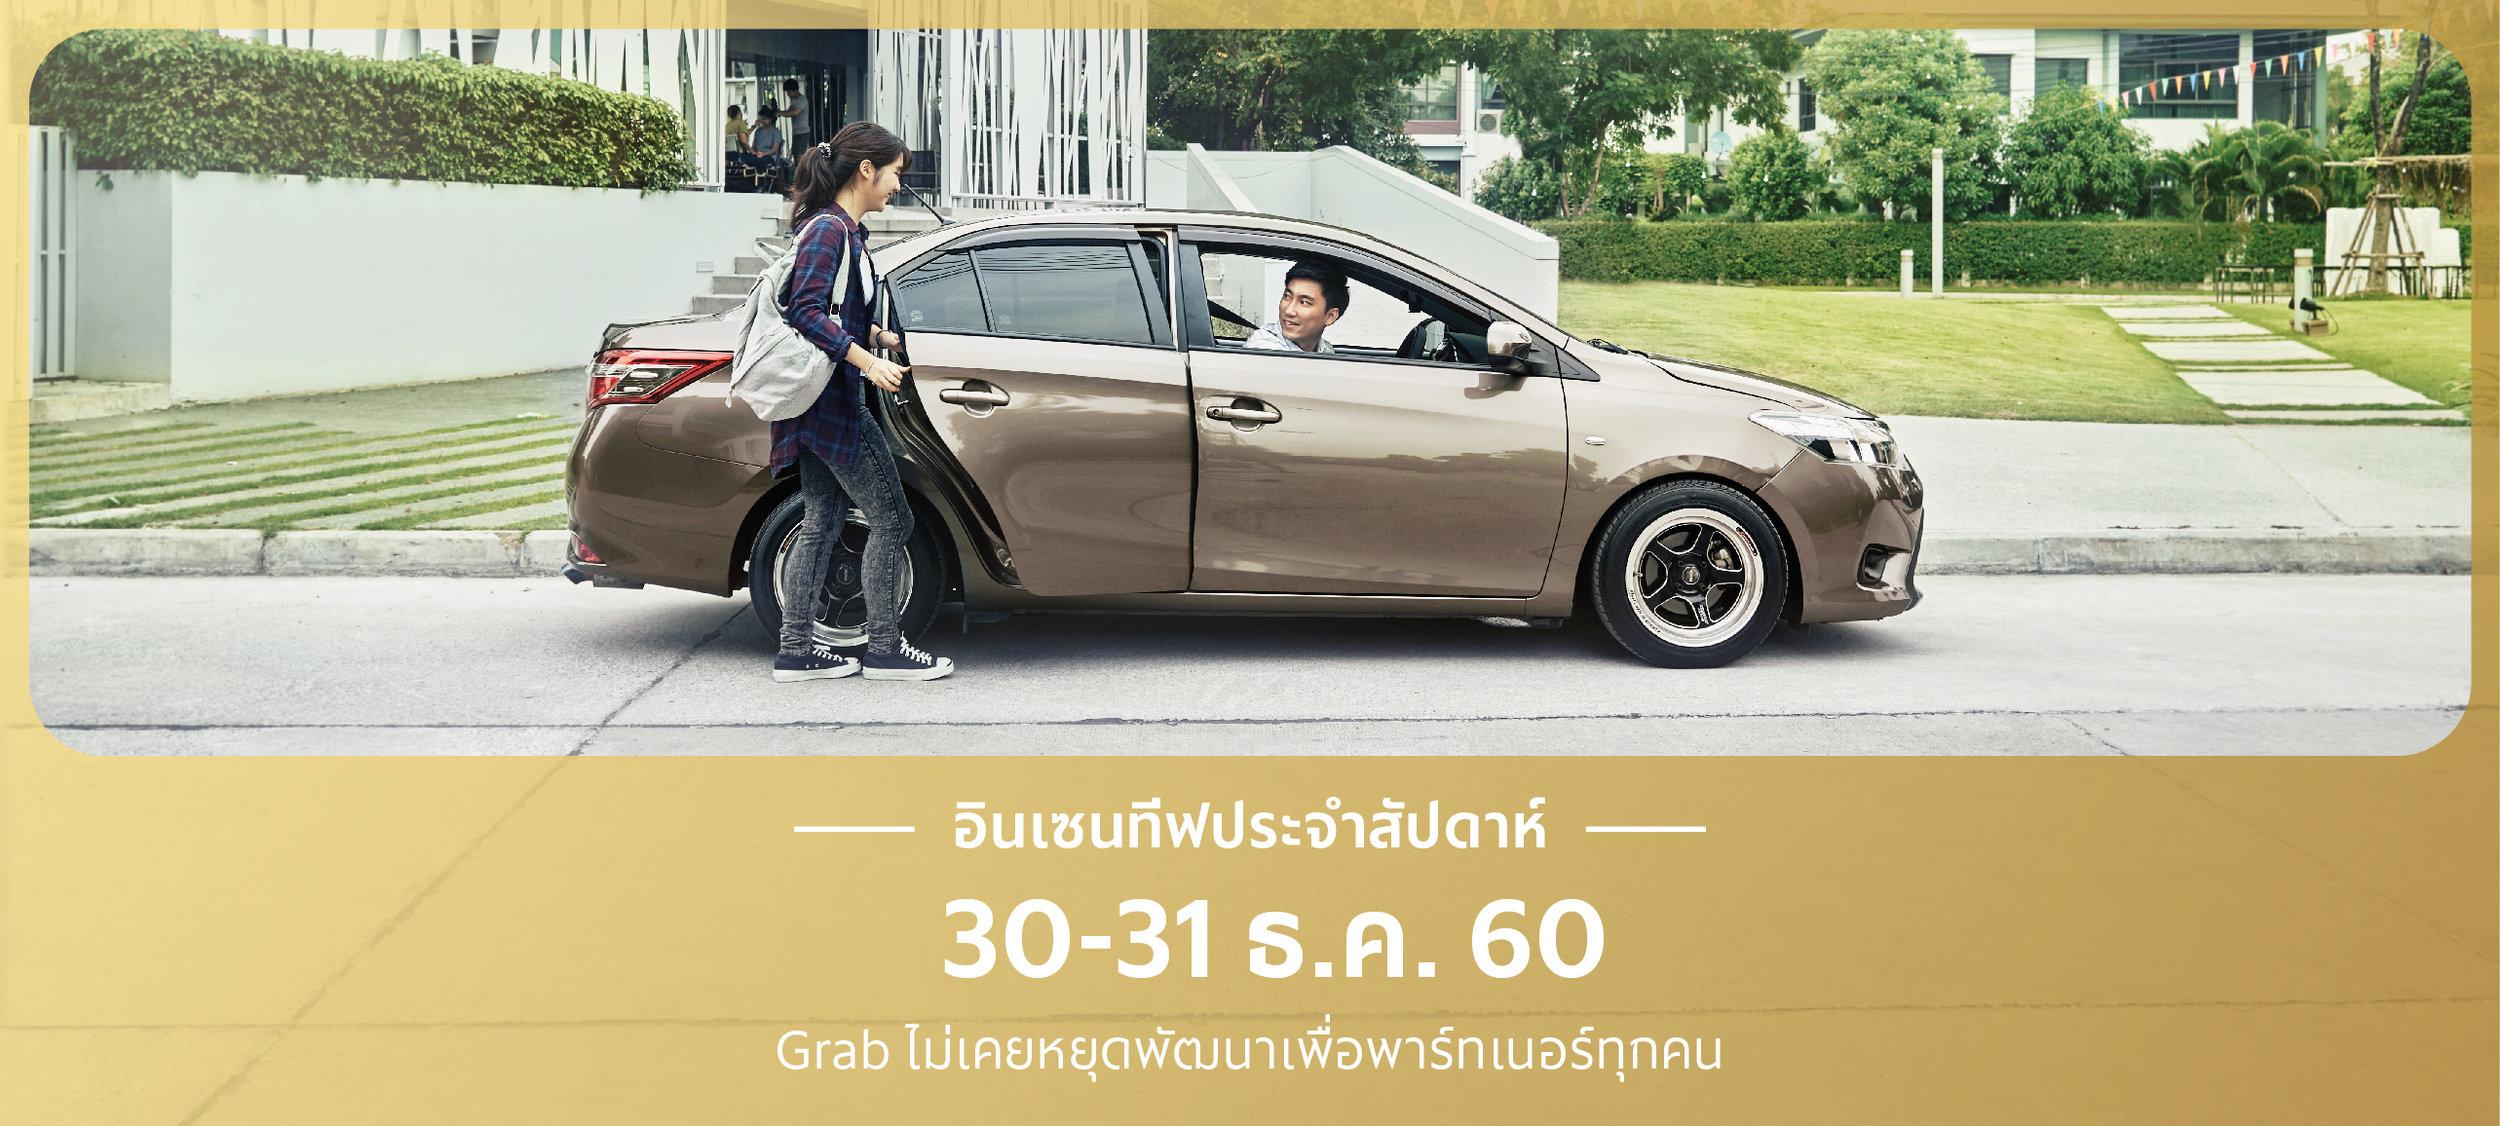 incentive OTC 30-31_CNX Banner.jpg